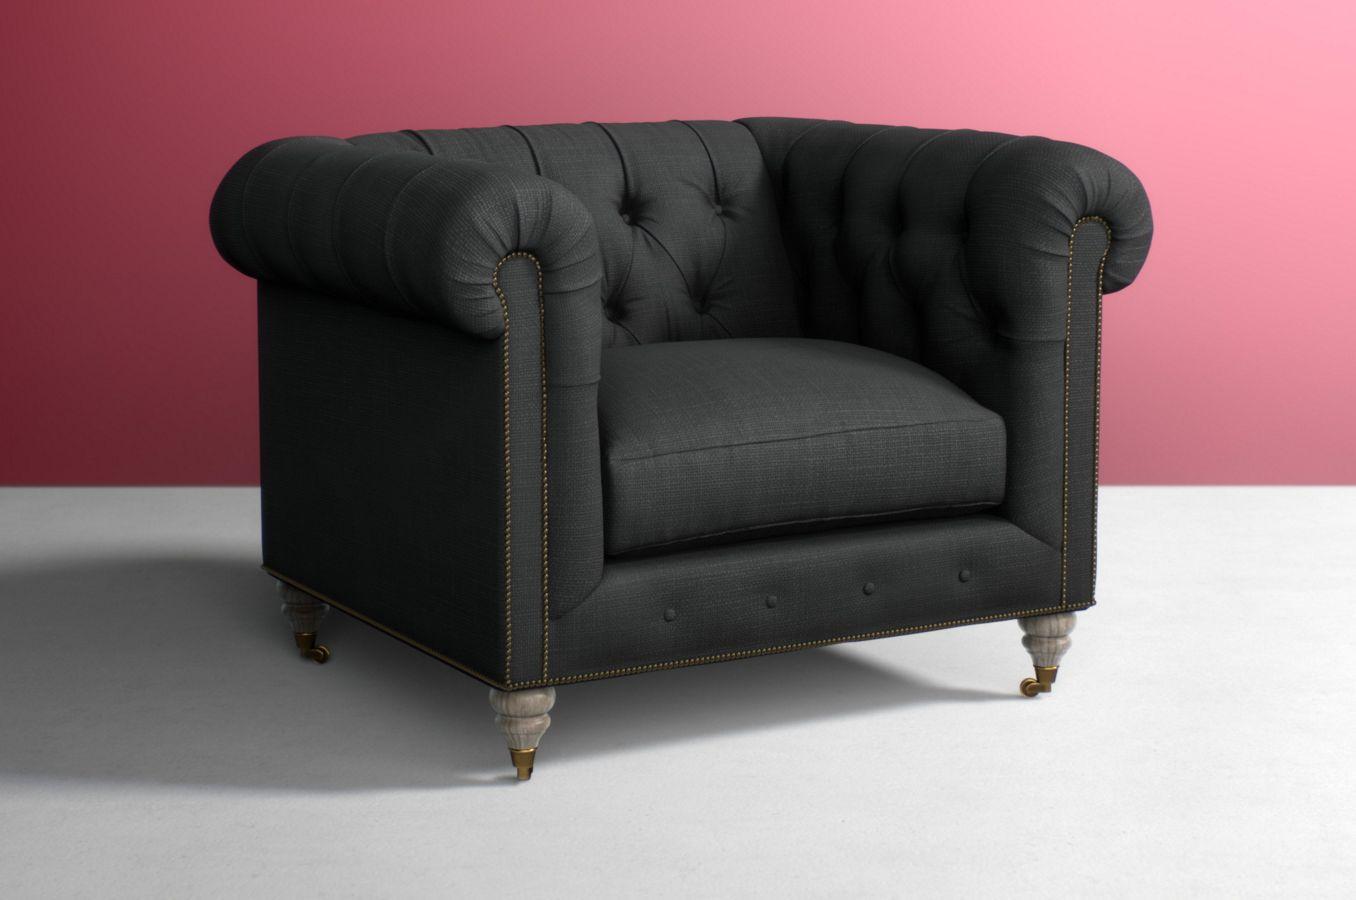 conrad armchair vintage chair leather pin chesterfield cigar